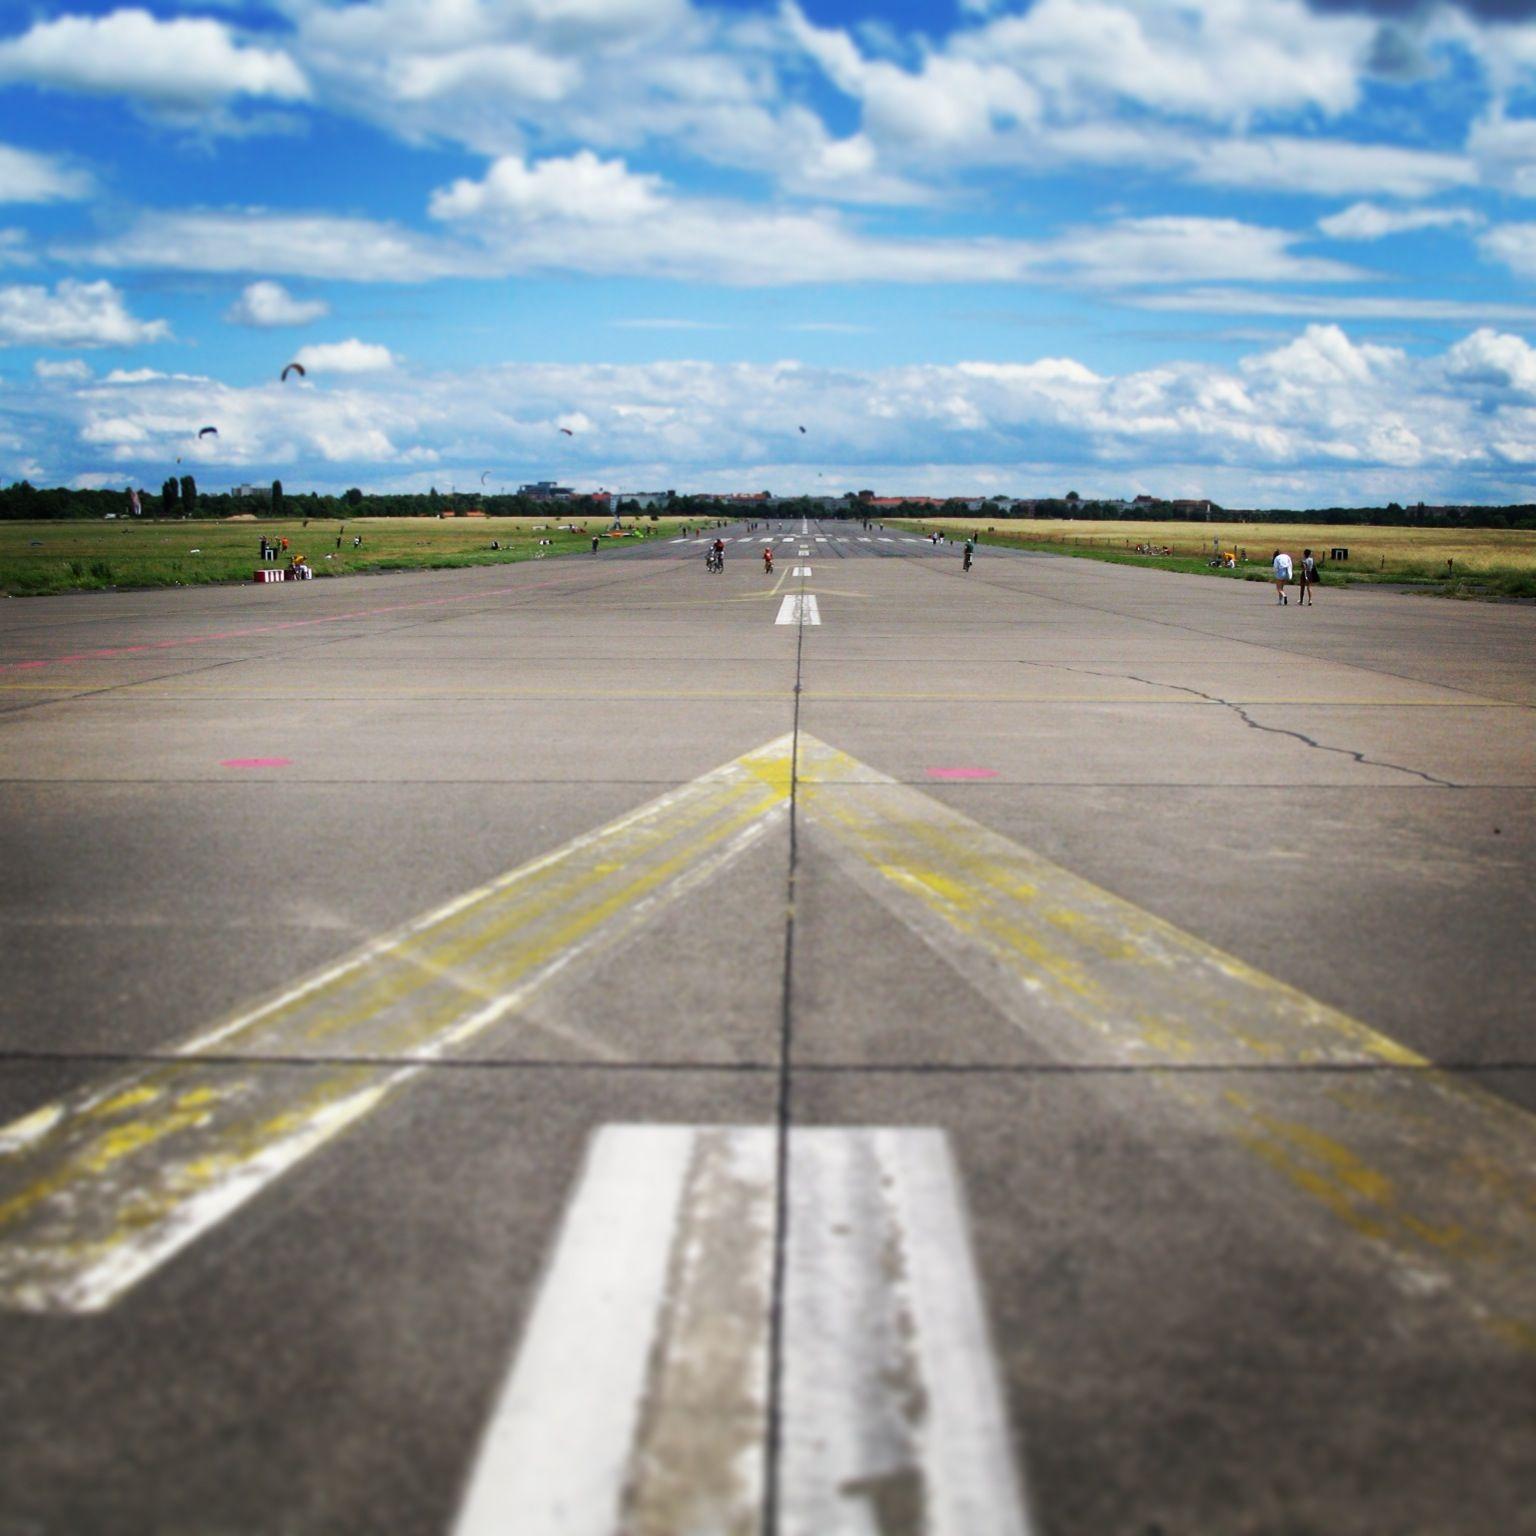 Berlin Tempelhof, The Abandoned Airport In Berlin, Germany